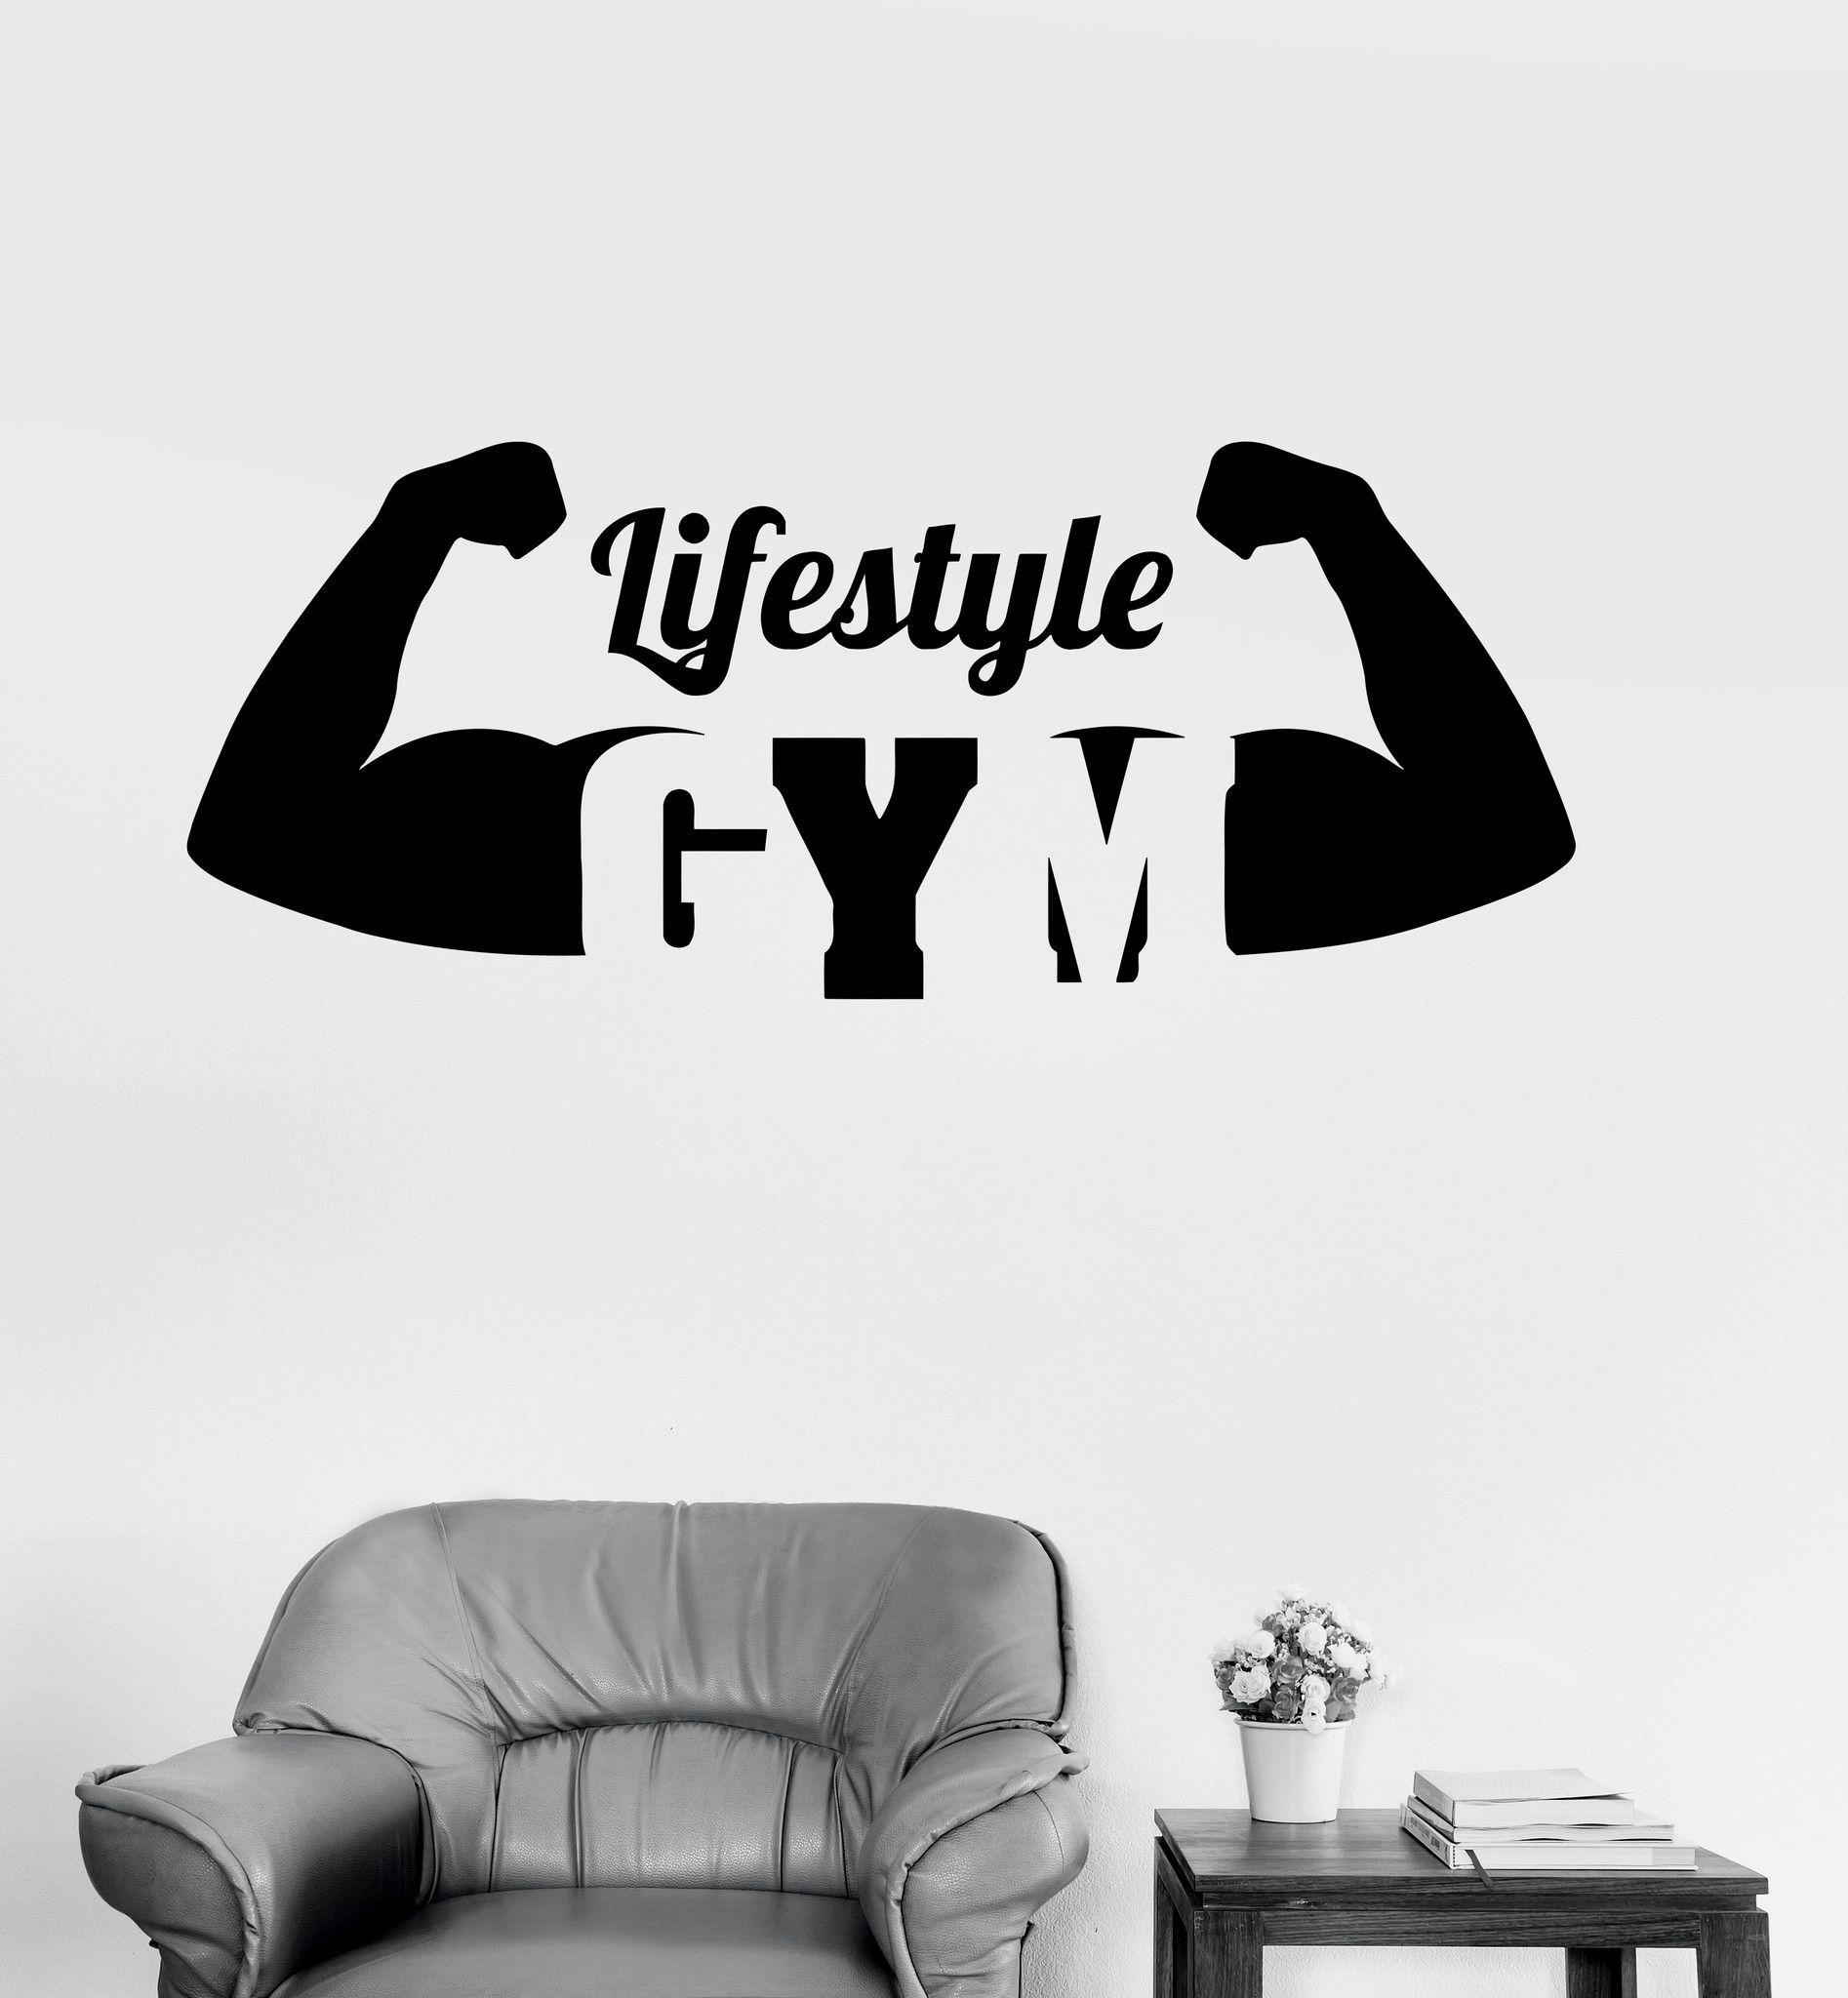 Vinyl Decal Gym Healthy Lifestyle Motivation Sport Fitness - Custom vinyl decal application fluidhow to make decal application fluidhair loss surgery